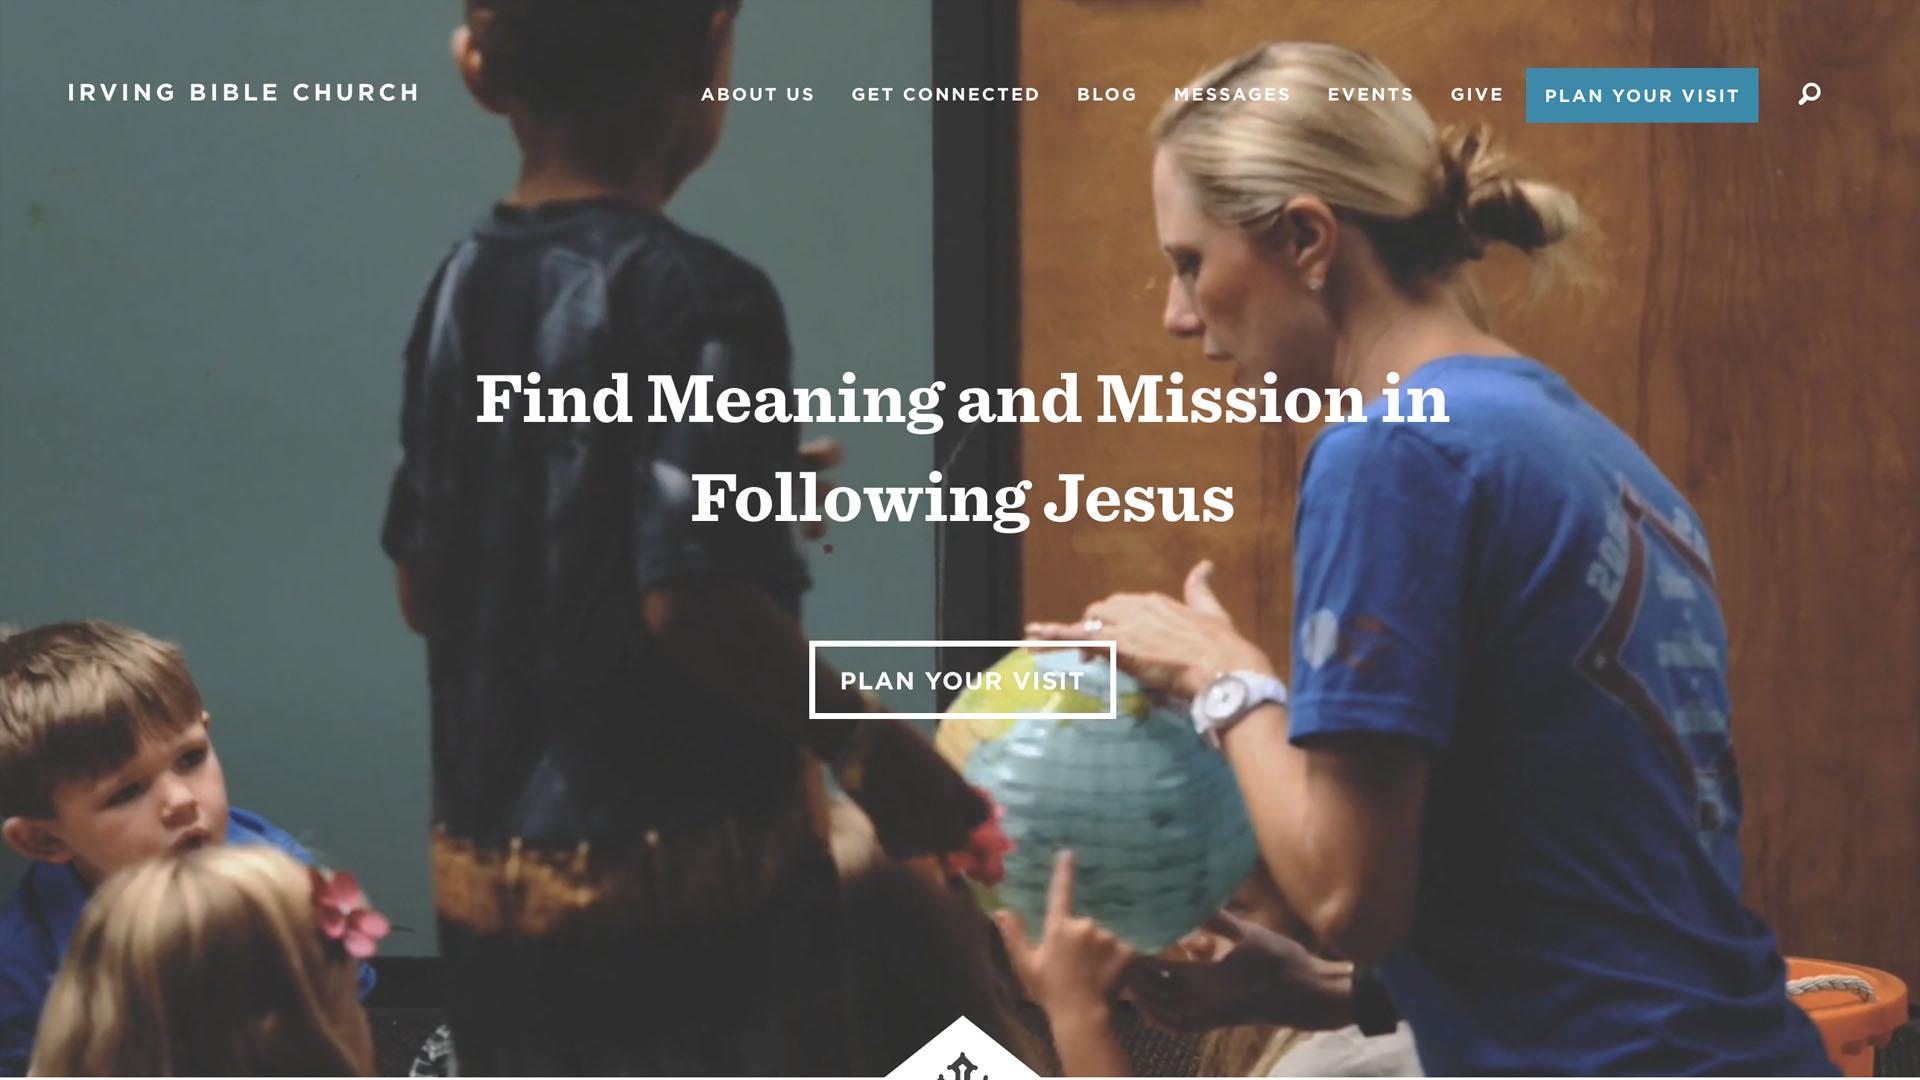 Irving Bible Church - http://www.irvingbible.org/